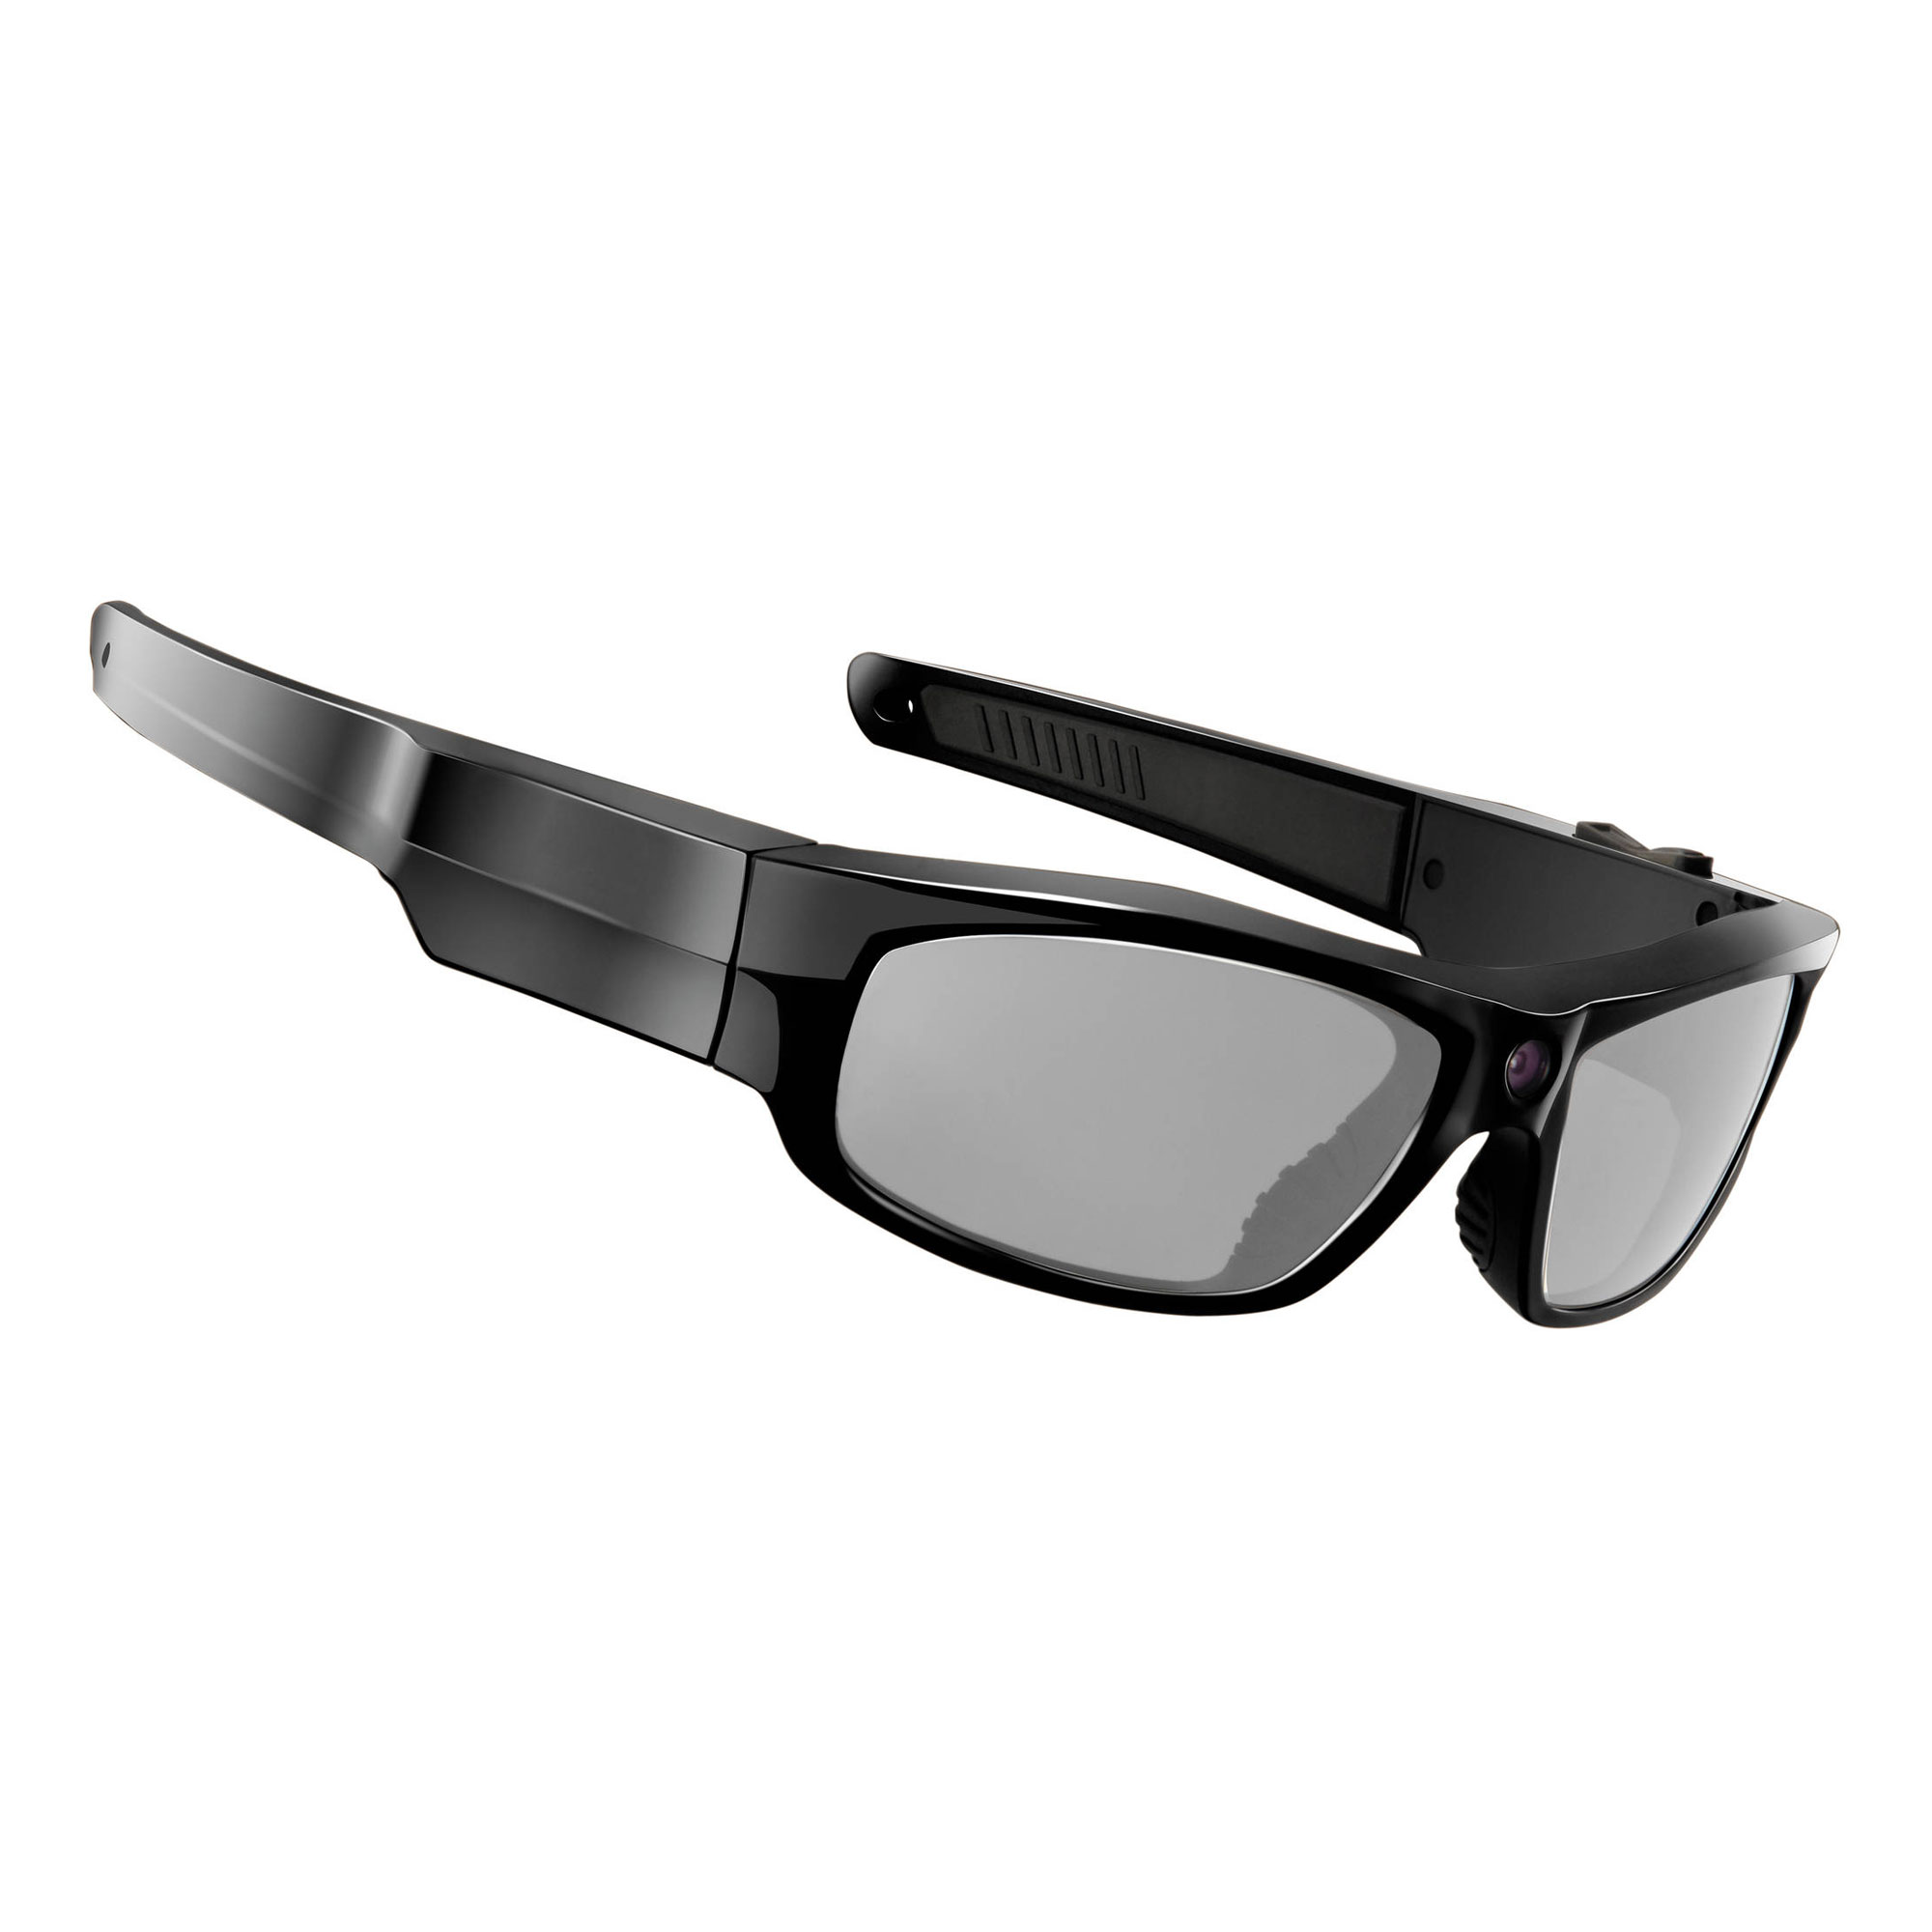 Durango Glossy 1080p Video Recording Sunglasses Black